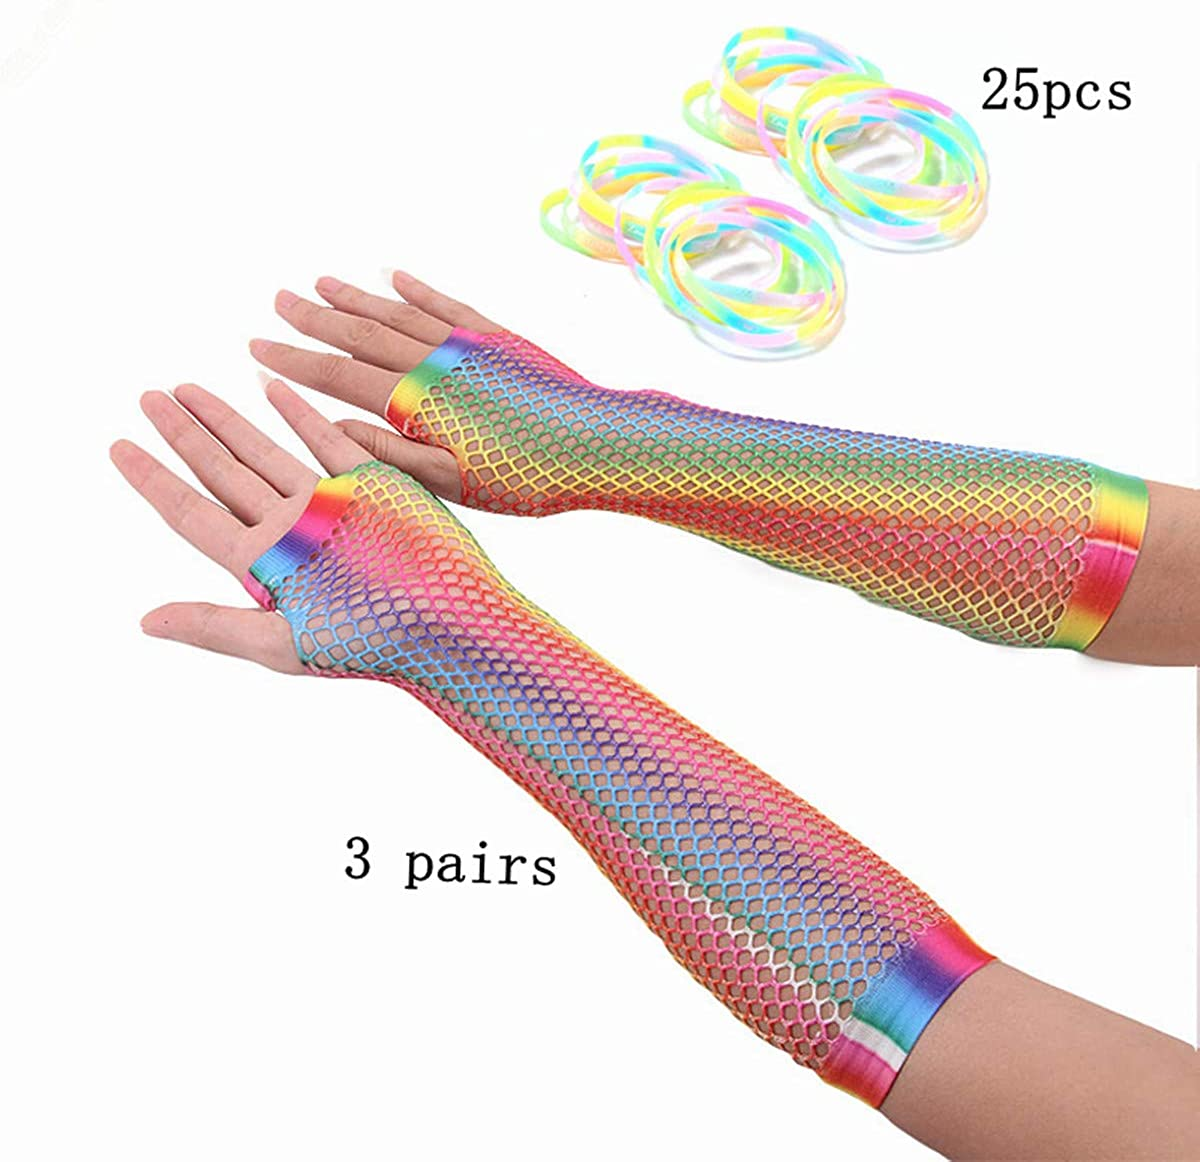 Neon Pink Long Neon Fishnet Fingerless Wrist Gloves Party Accessory